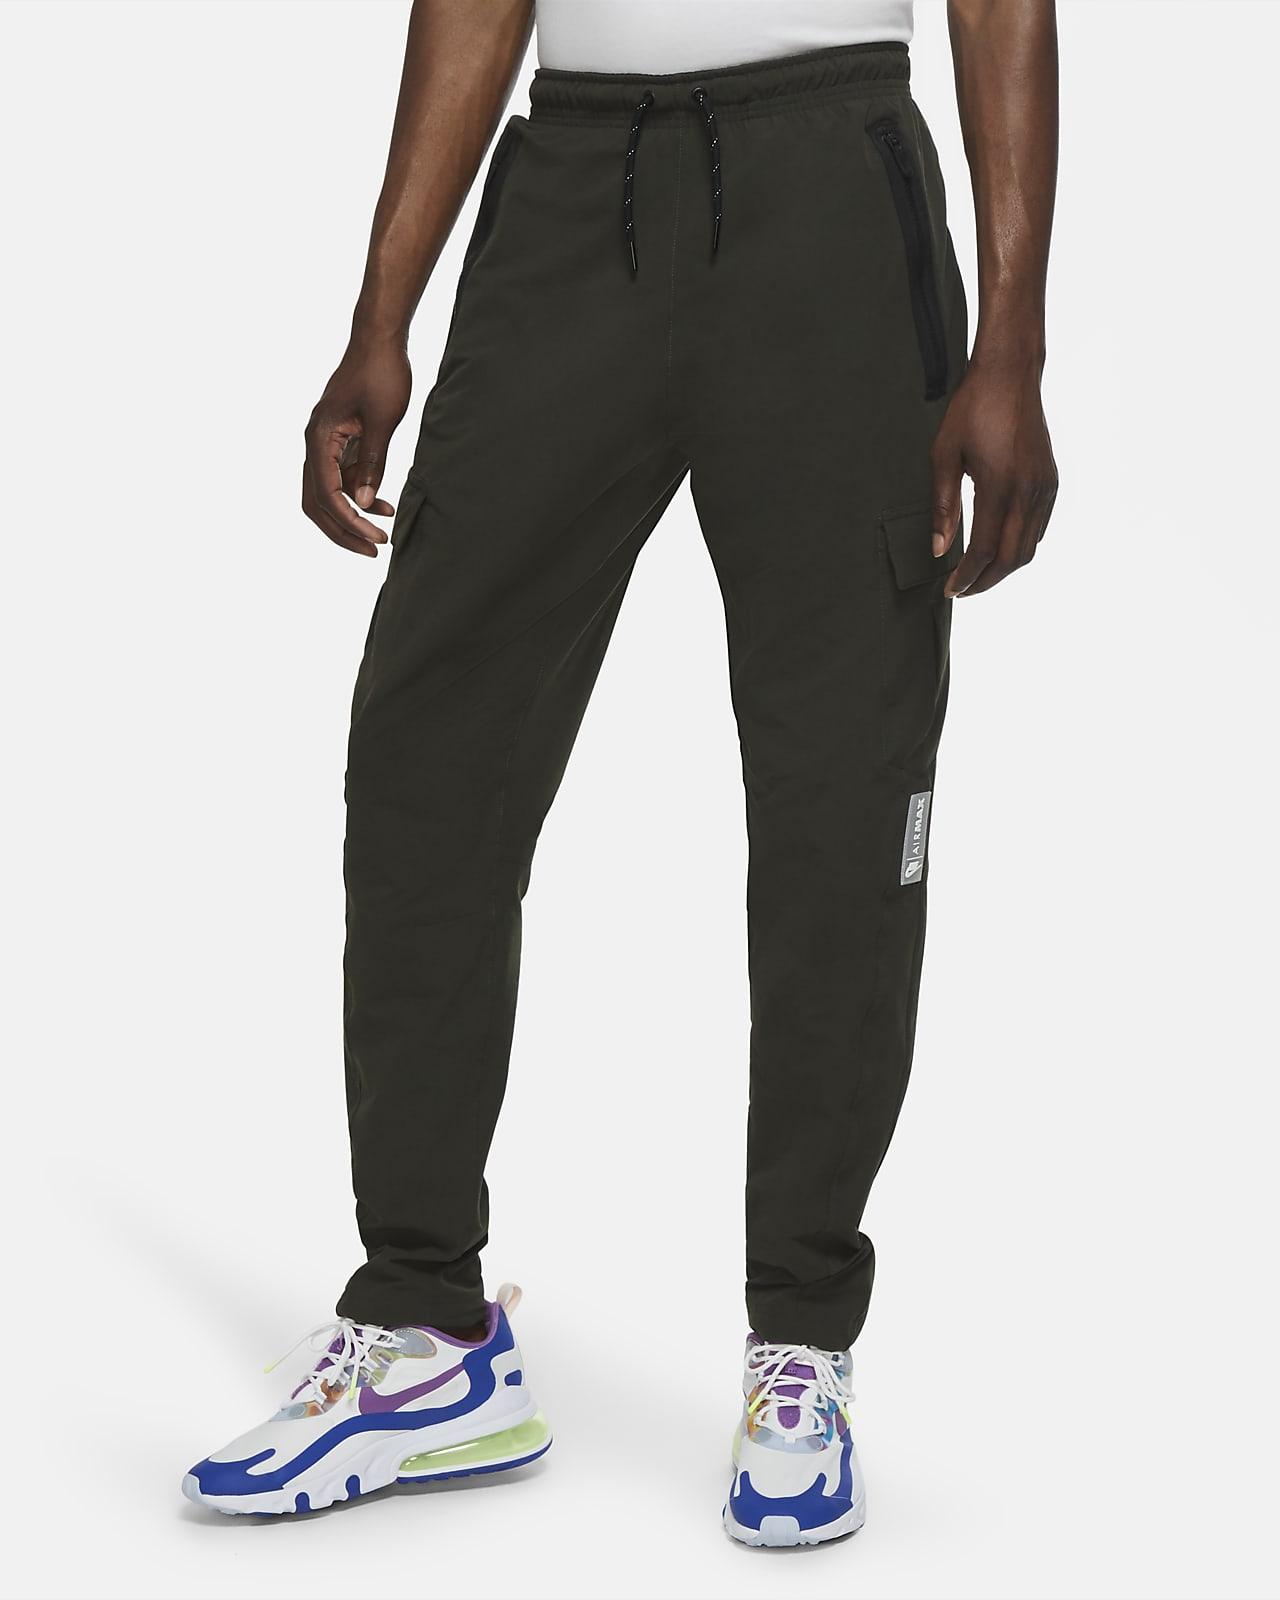 Nike Sportswear Air Max Men's Woven Cargo Trousers